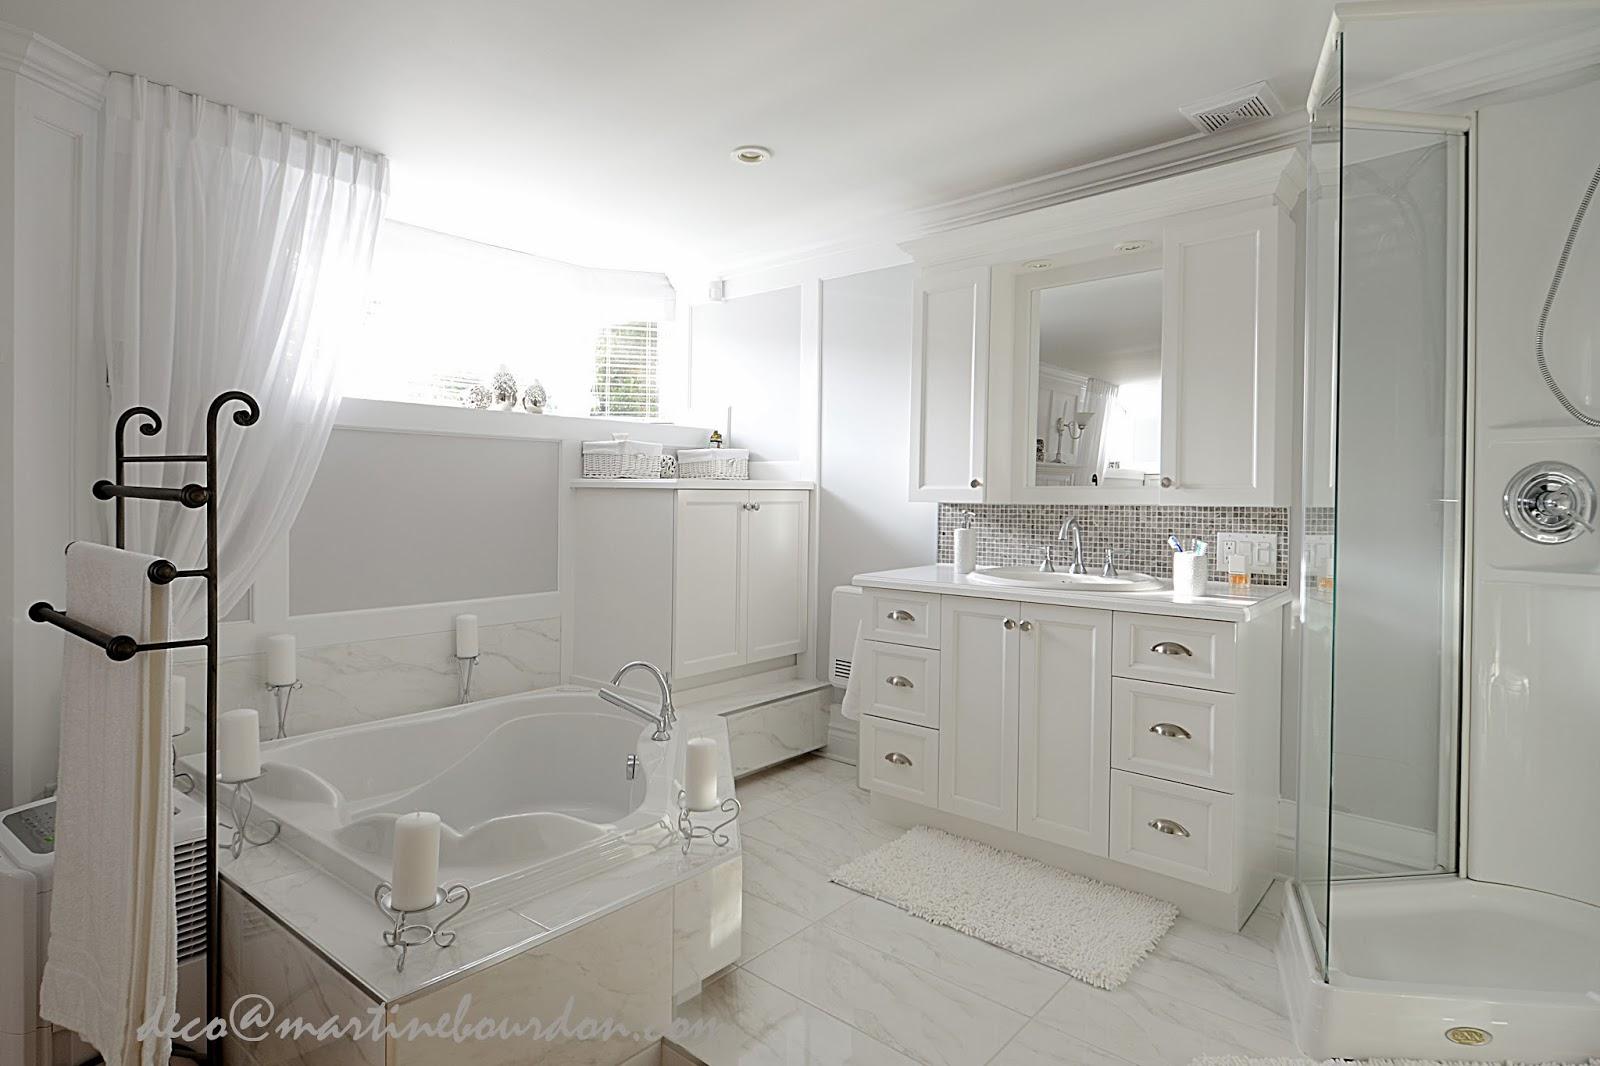 Meuble salle de bain ikea avis medium size of fr for Meuble salle de bain ikea avis